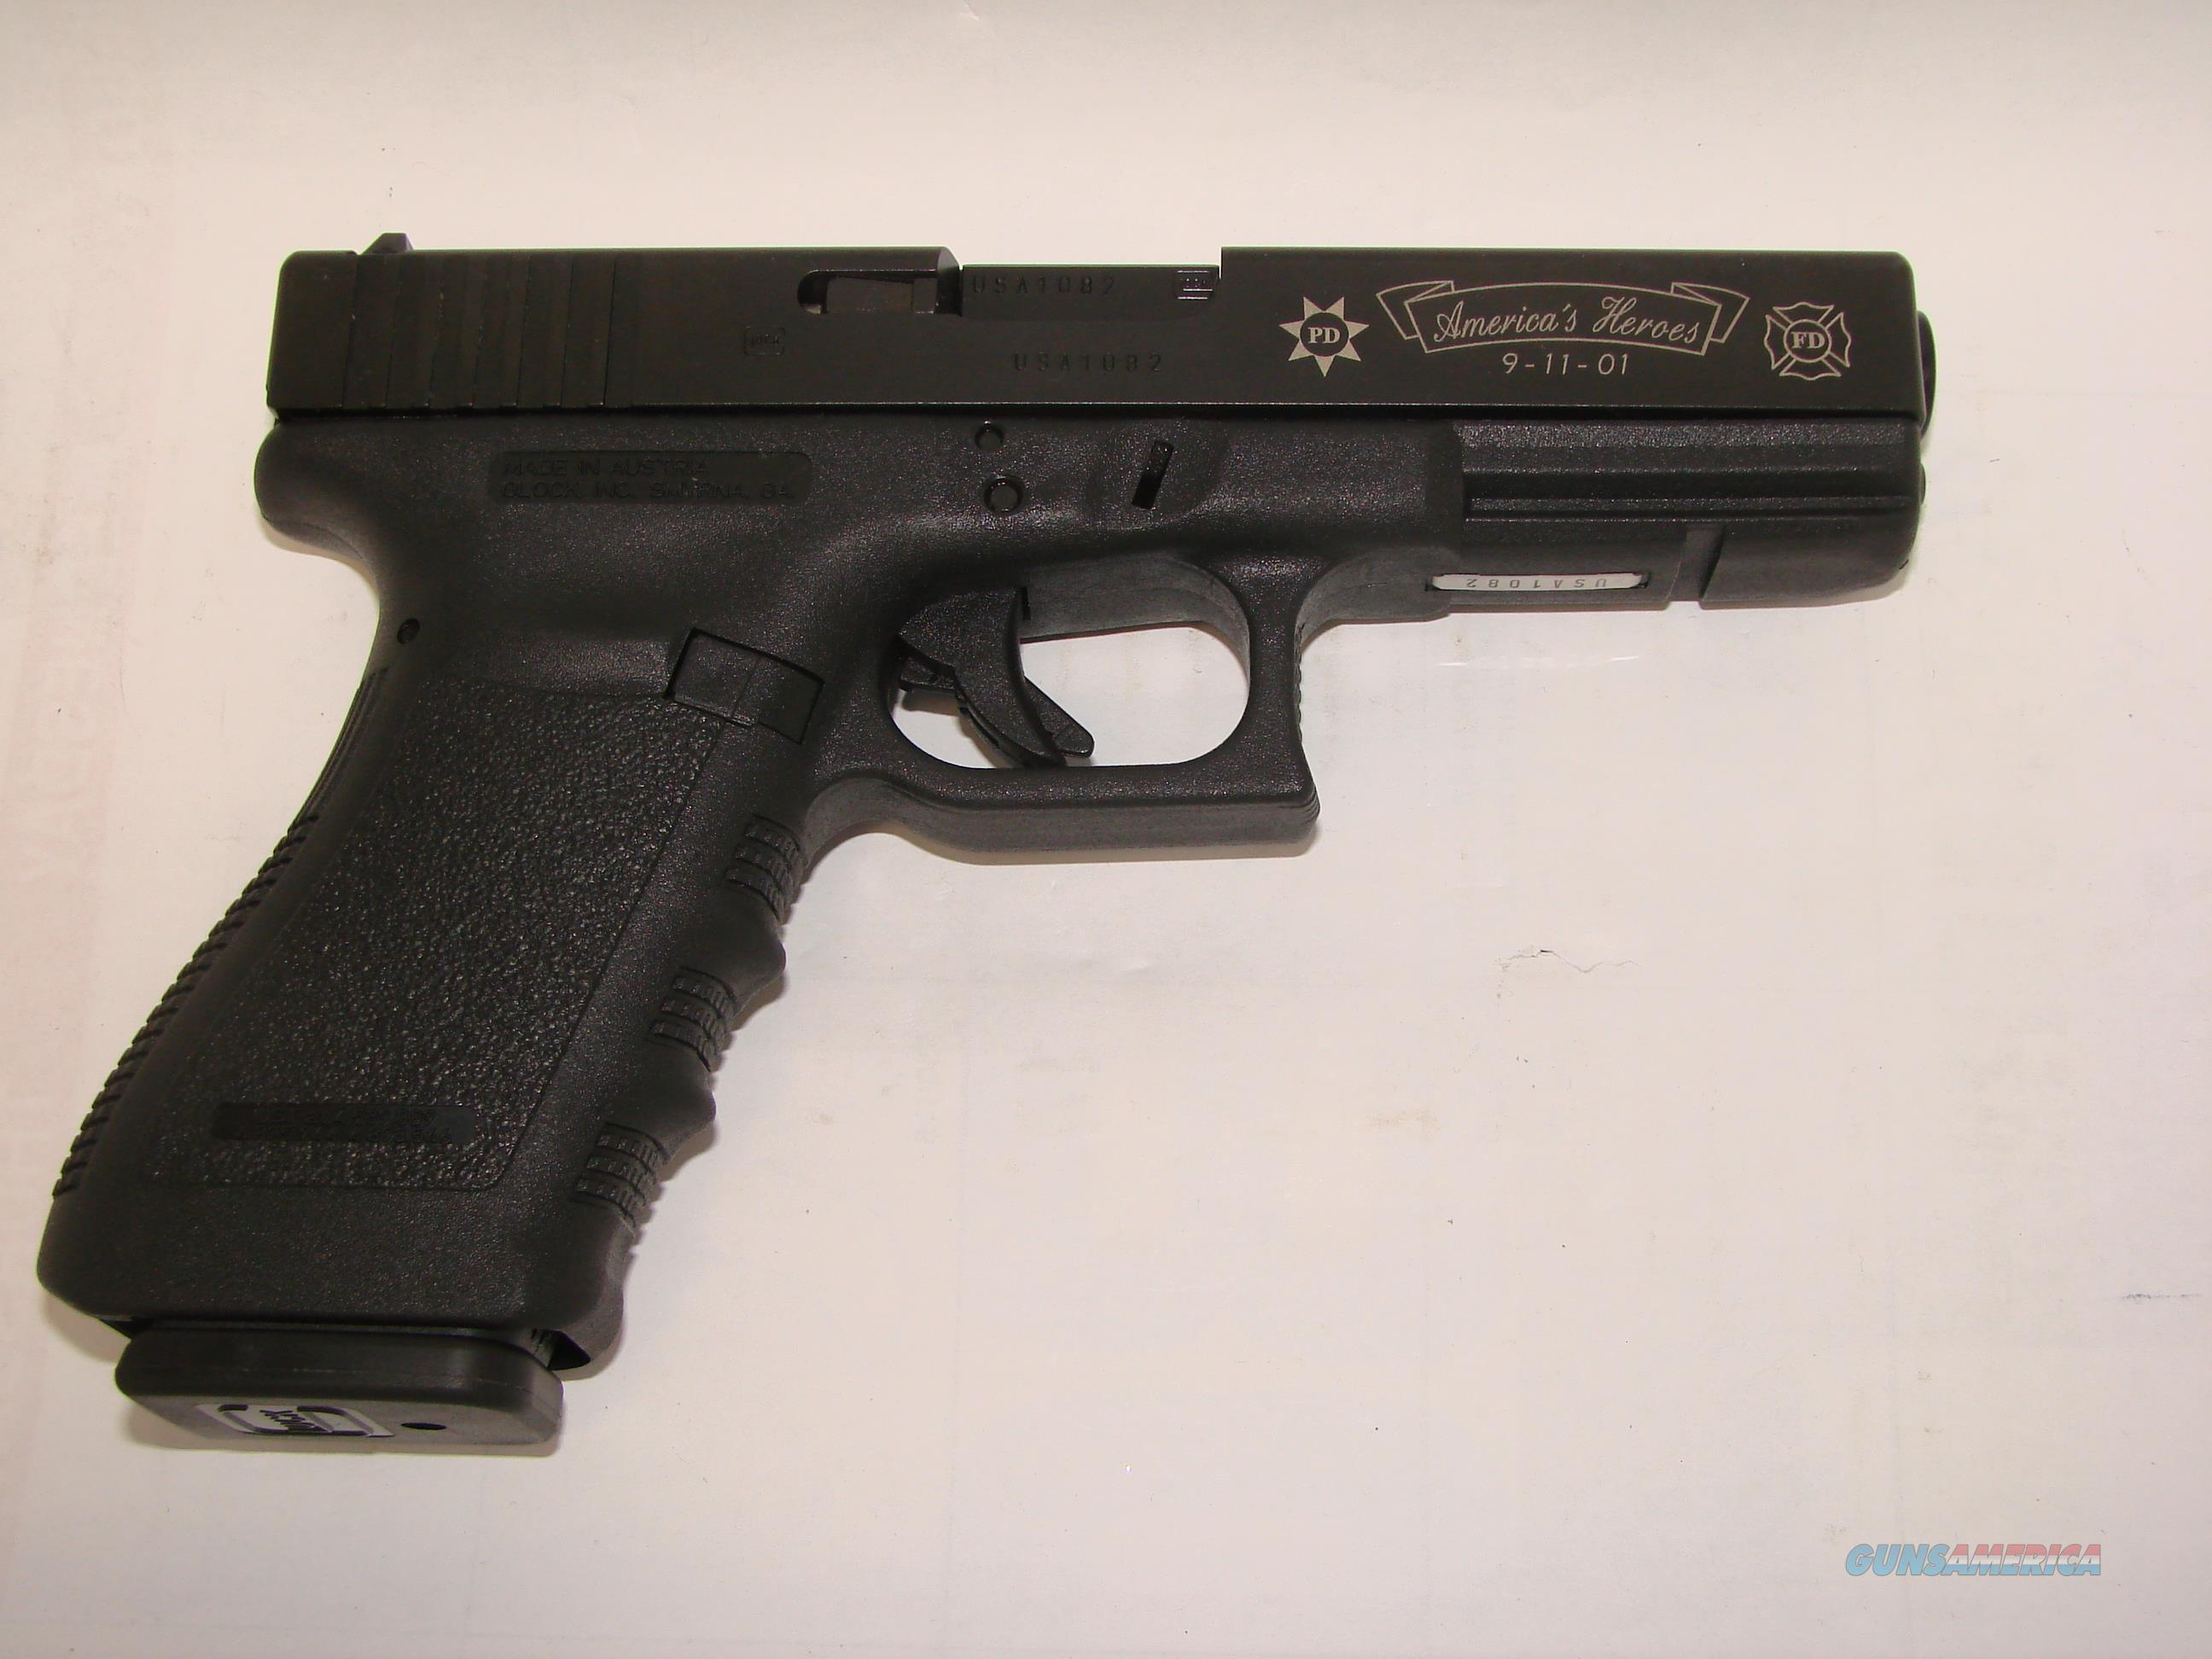 Glock 21 9/11 America's Heroes  Guns > Pistols > Glock Pistols > 20/21